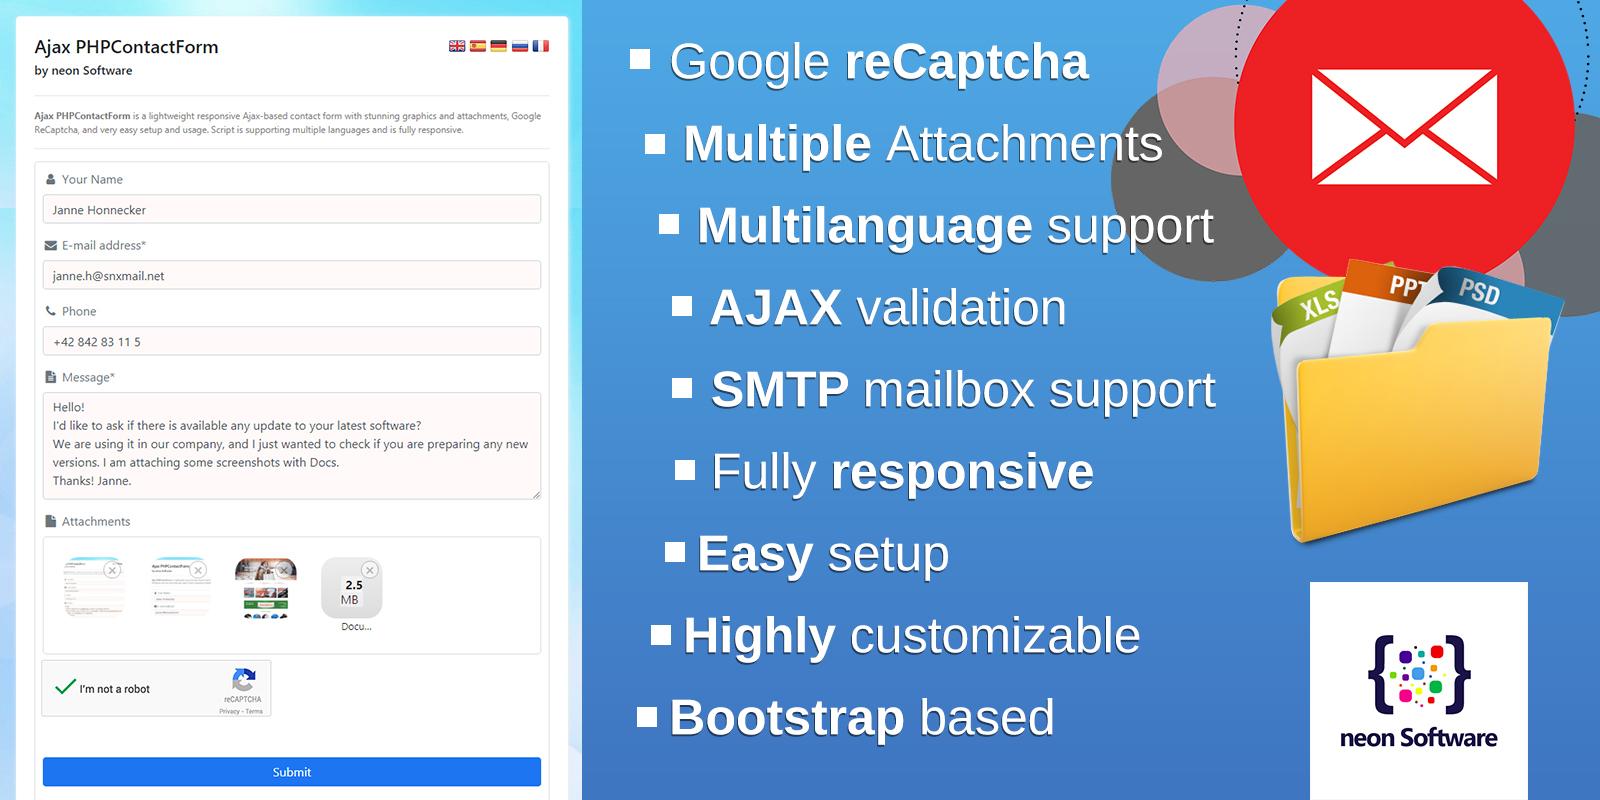 Ajax PHPContactForm - reponsive Ajax Contact Form with attachments